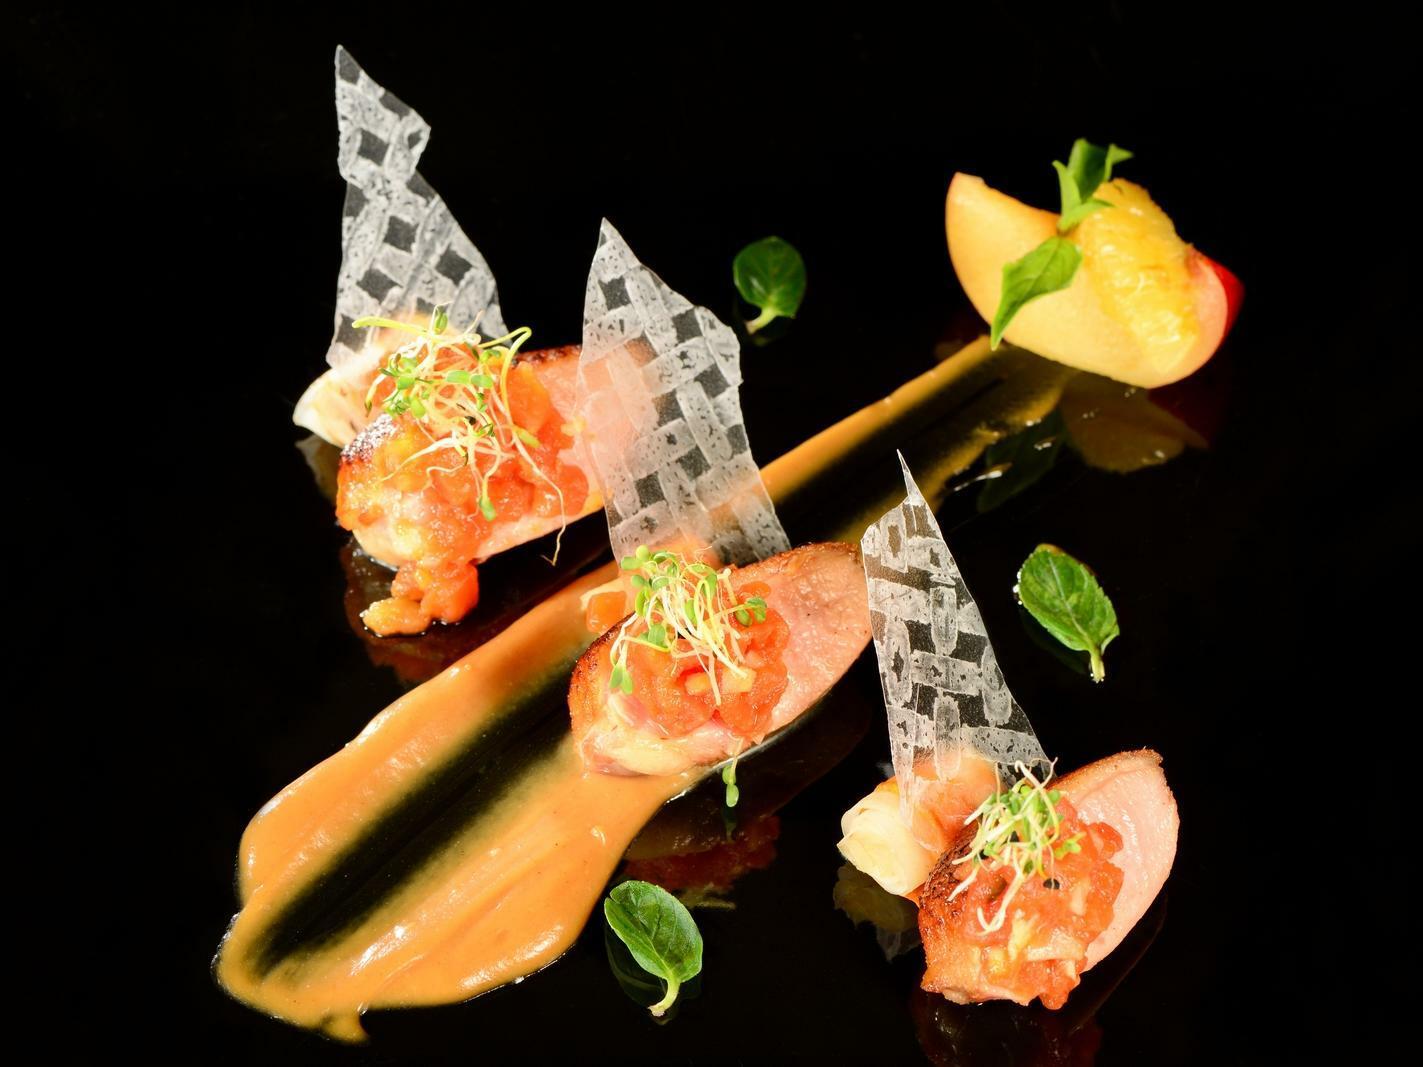 artfully plated food on black plate